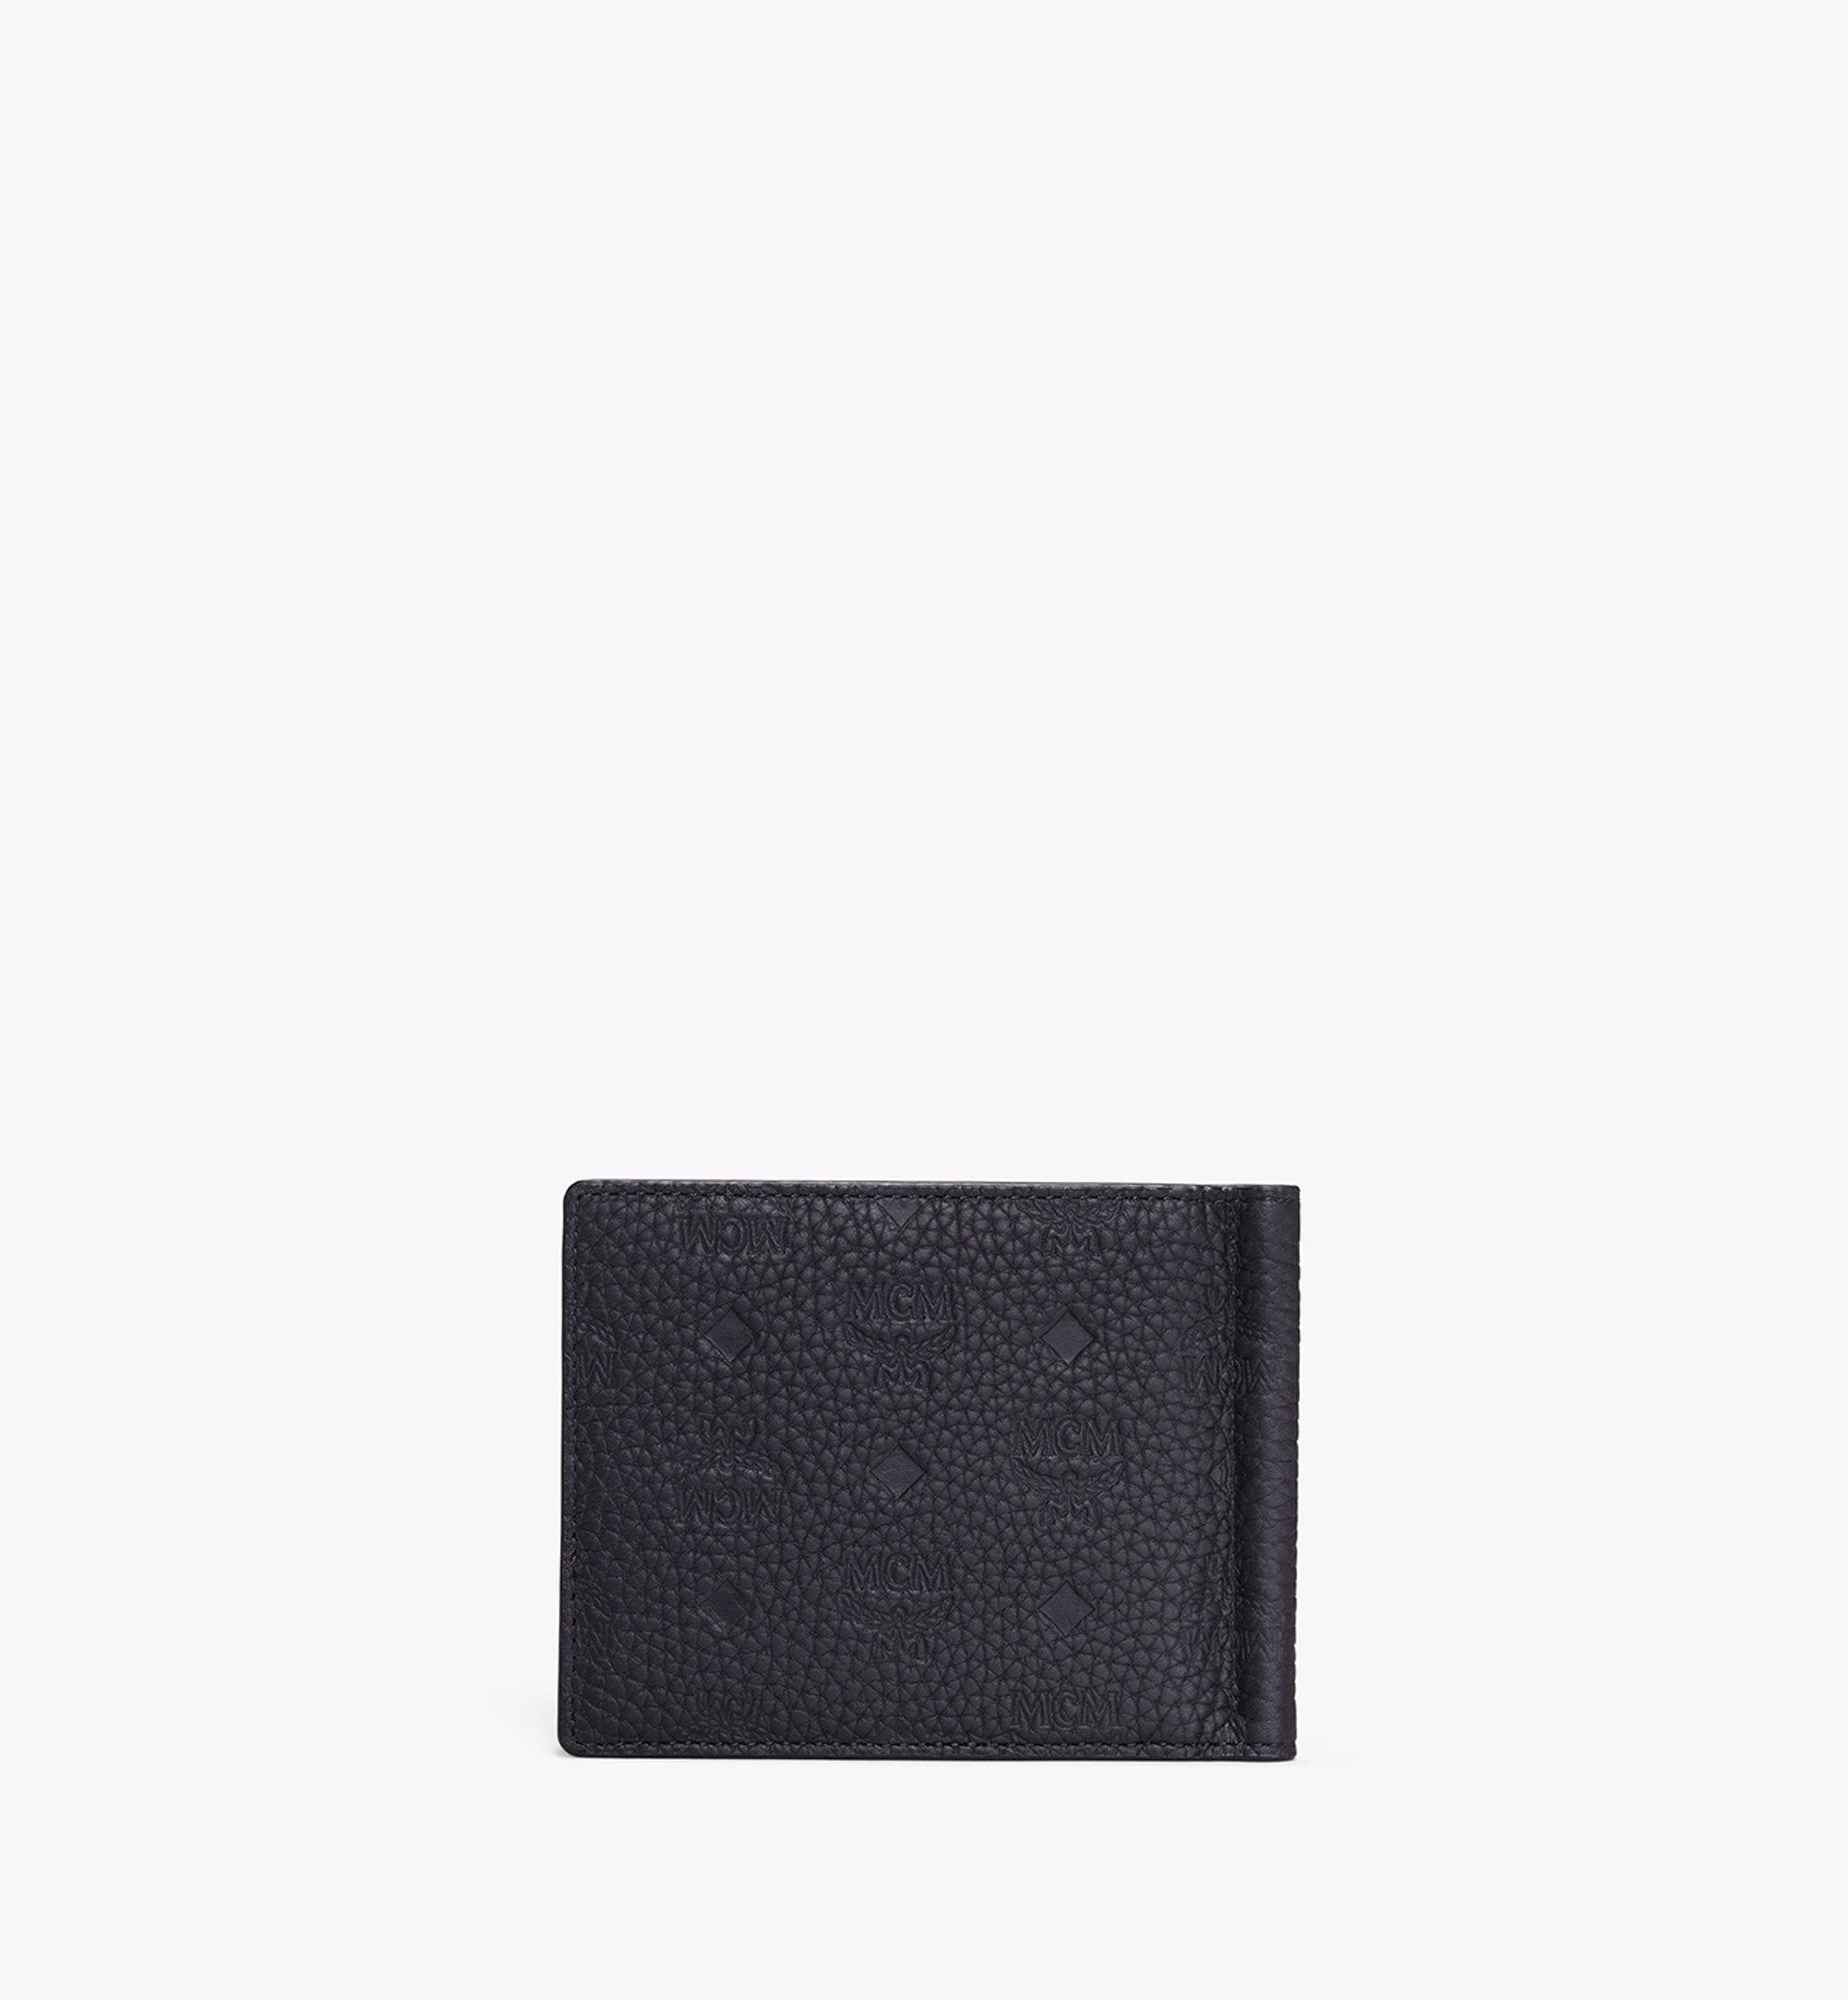 MCM Tivitat 皮革鈔票夾皮夾 Black MXC9ABT24BK001 更多視圖 1